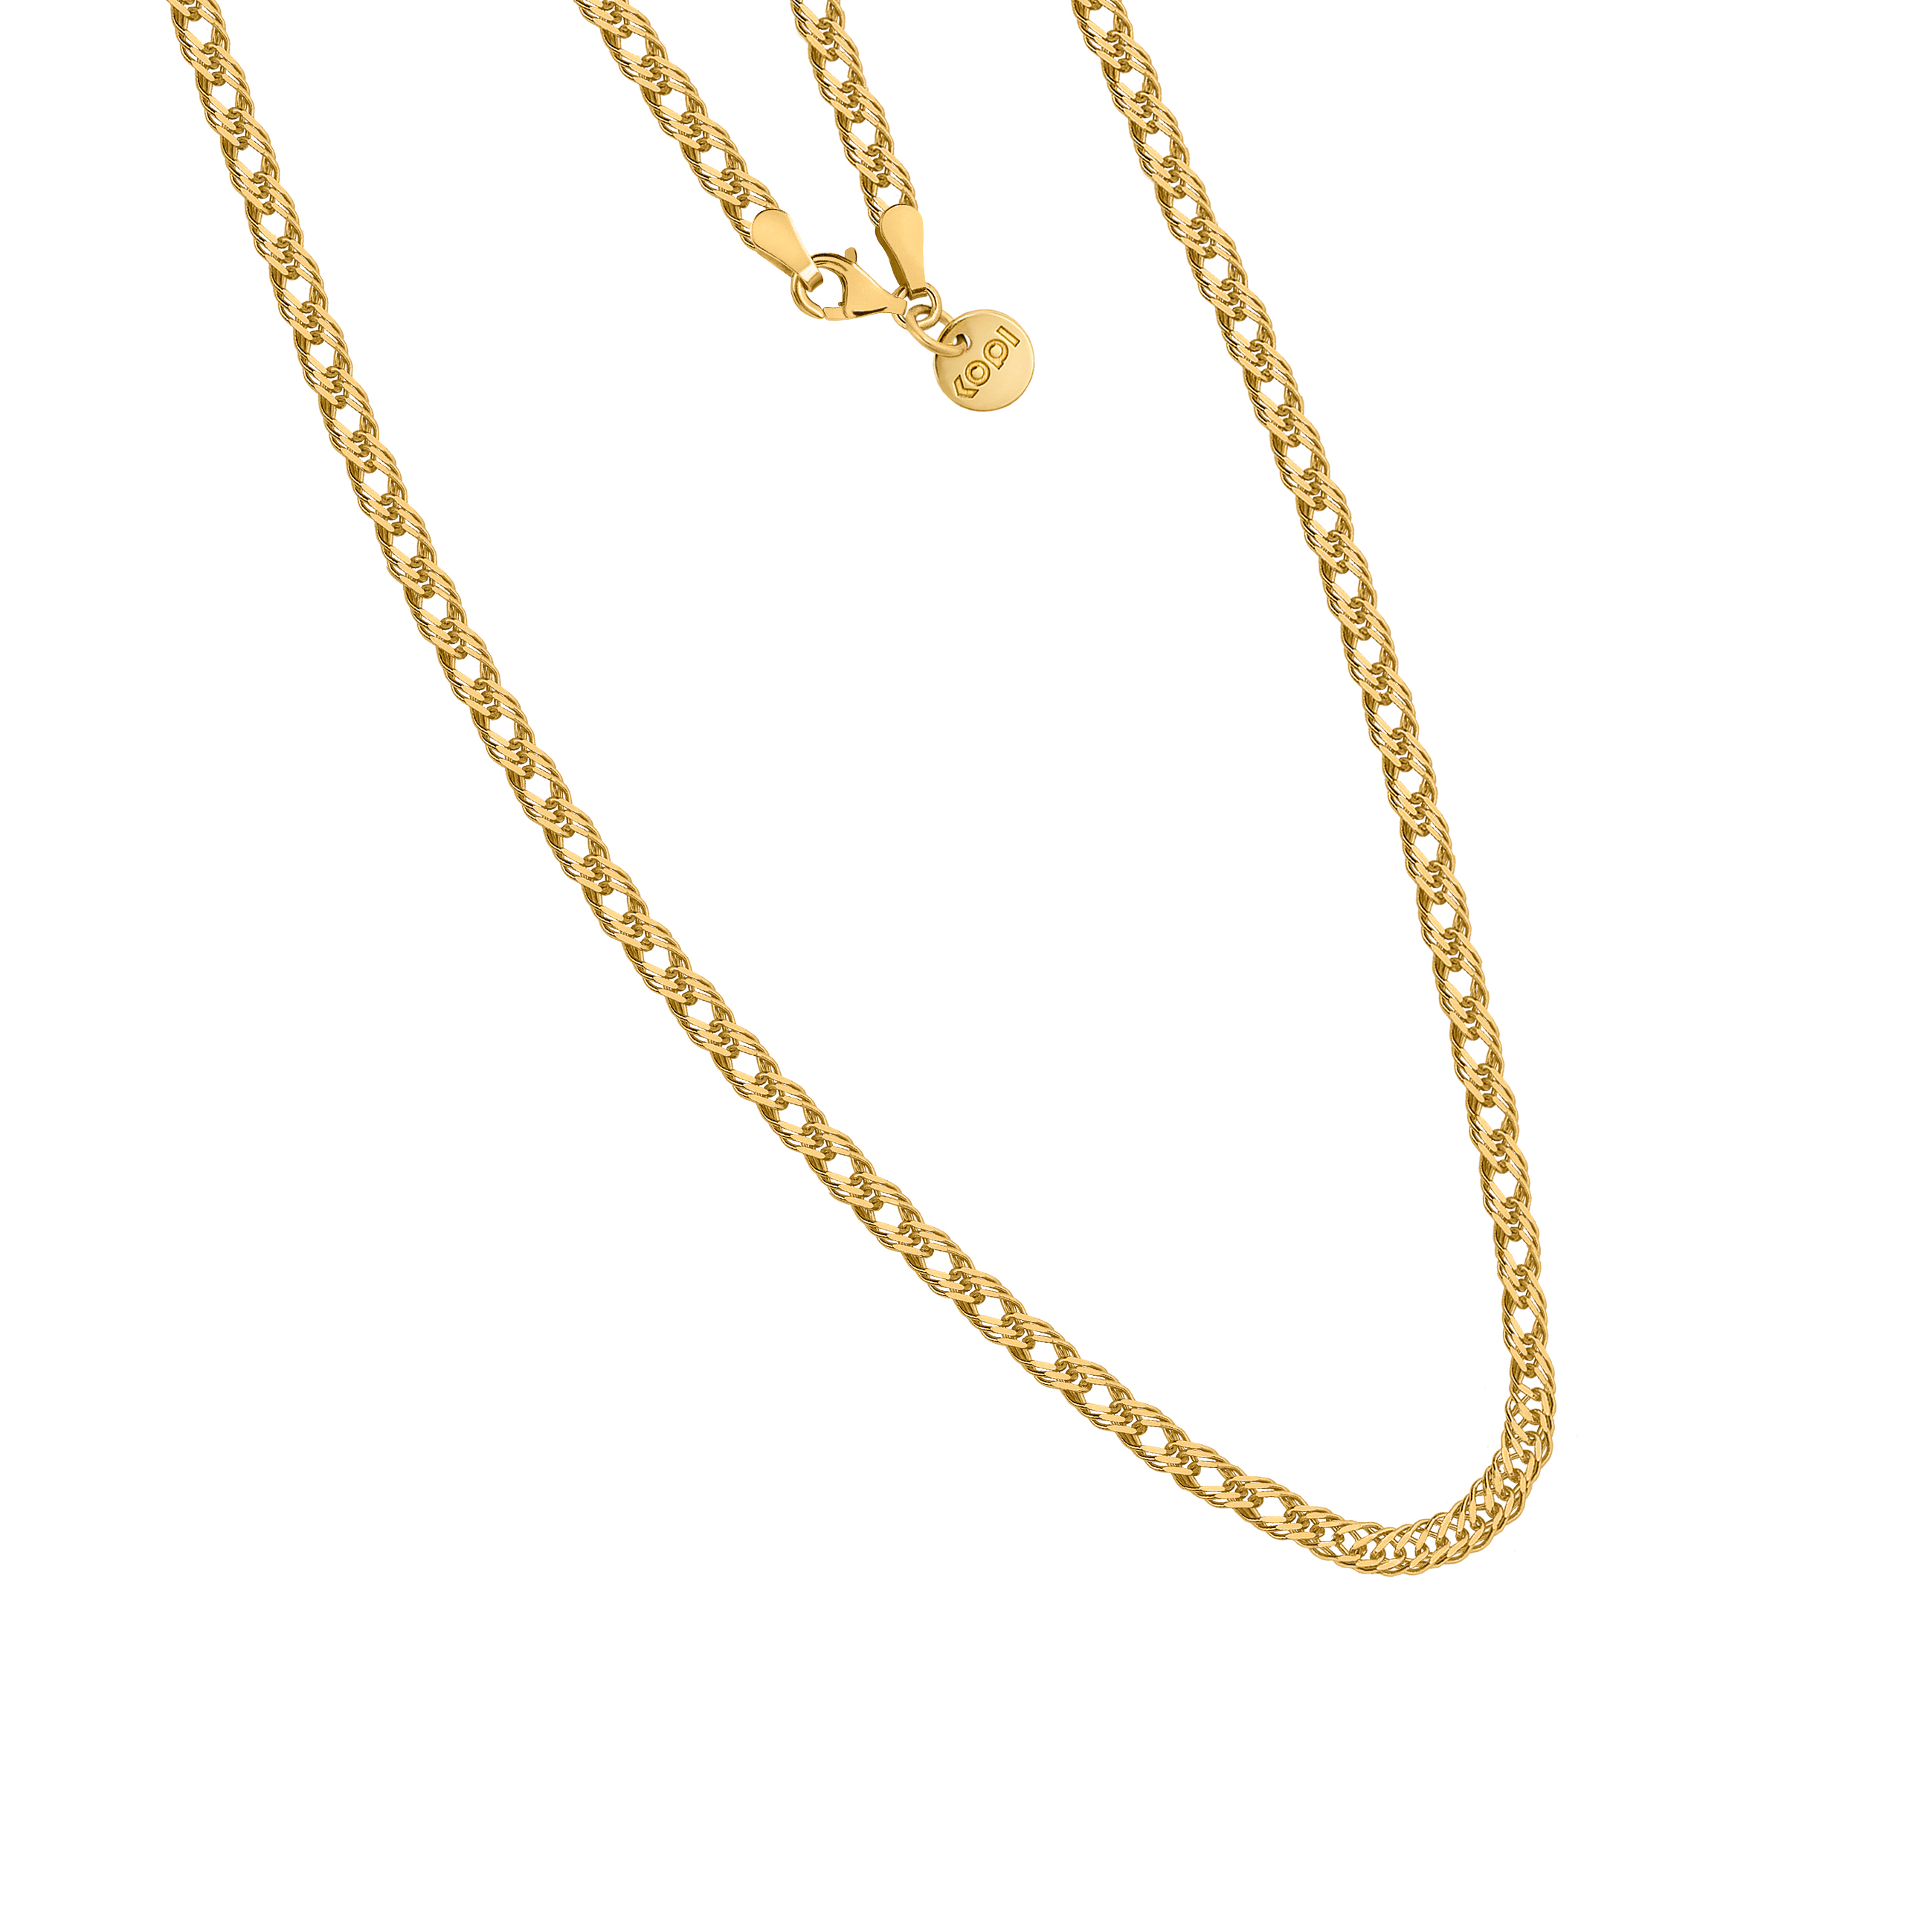 Chain Gold 3